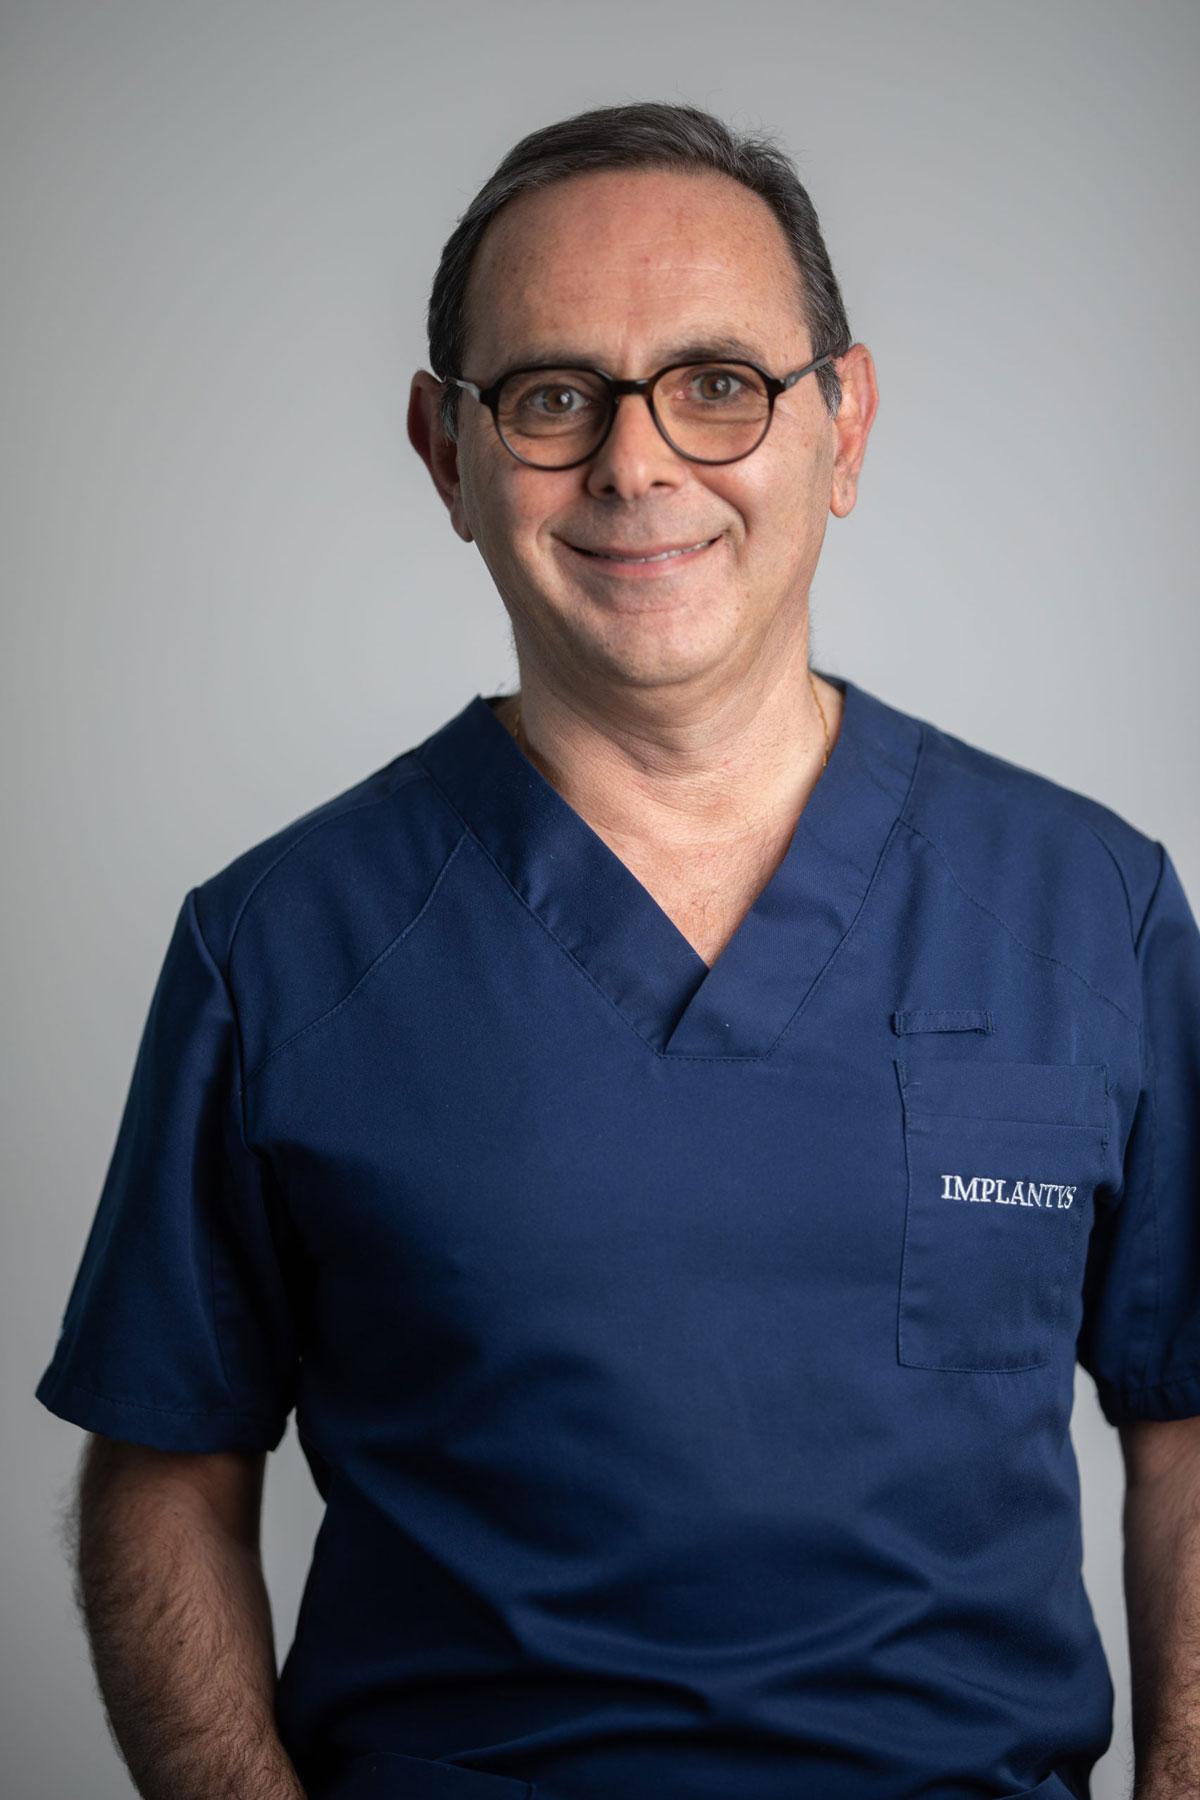 Dr Harmik Minassian dentiste implantologue